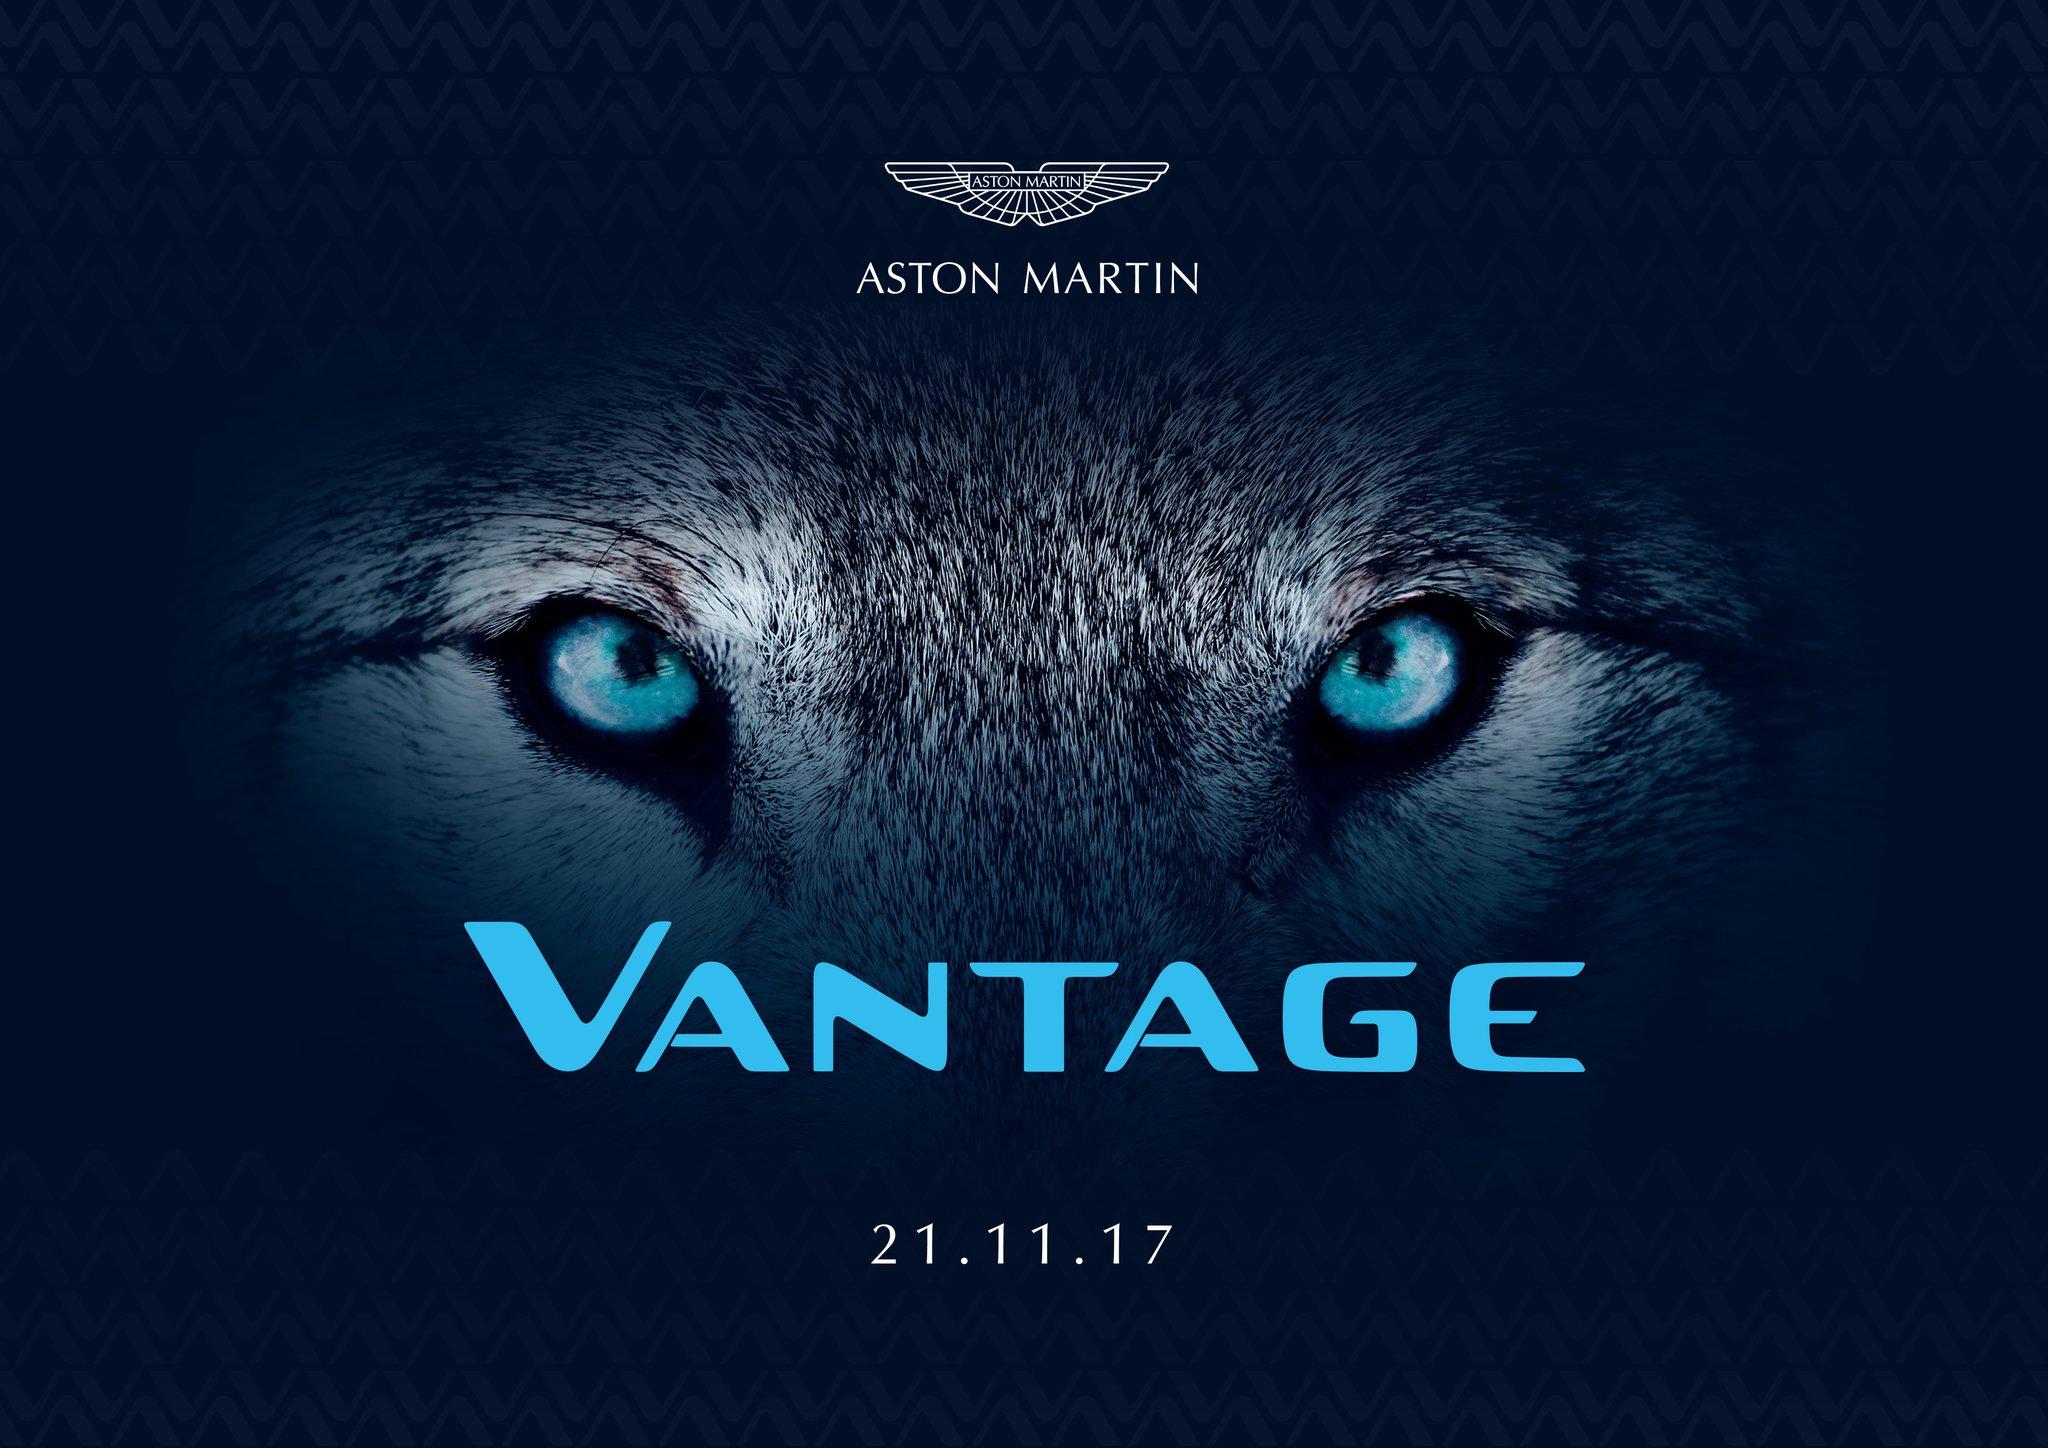 2019 Aston Martin Vantage Specifications Teased: M177 V8 Develops